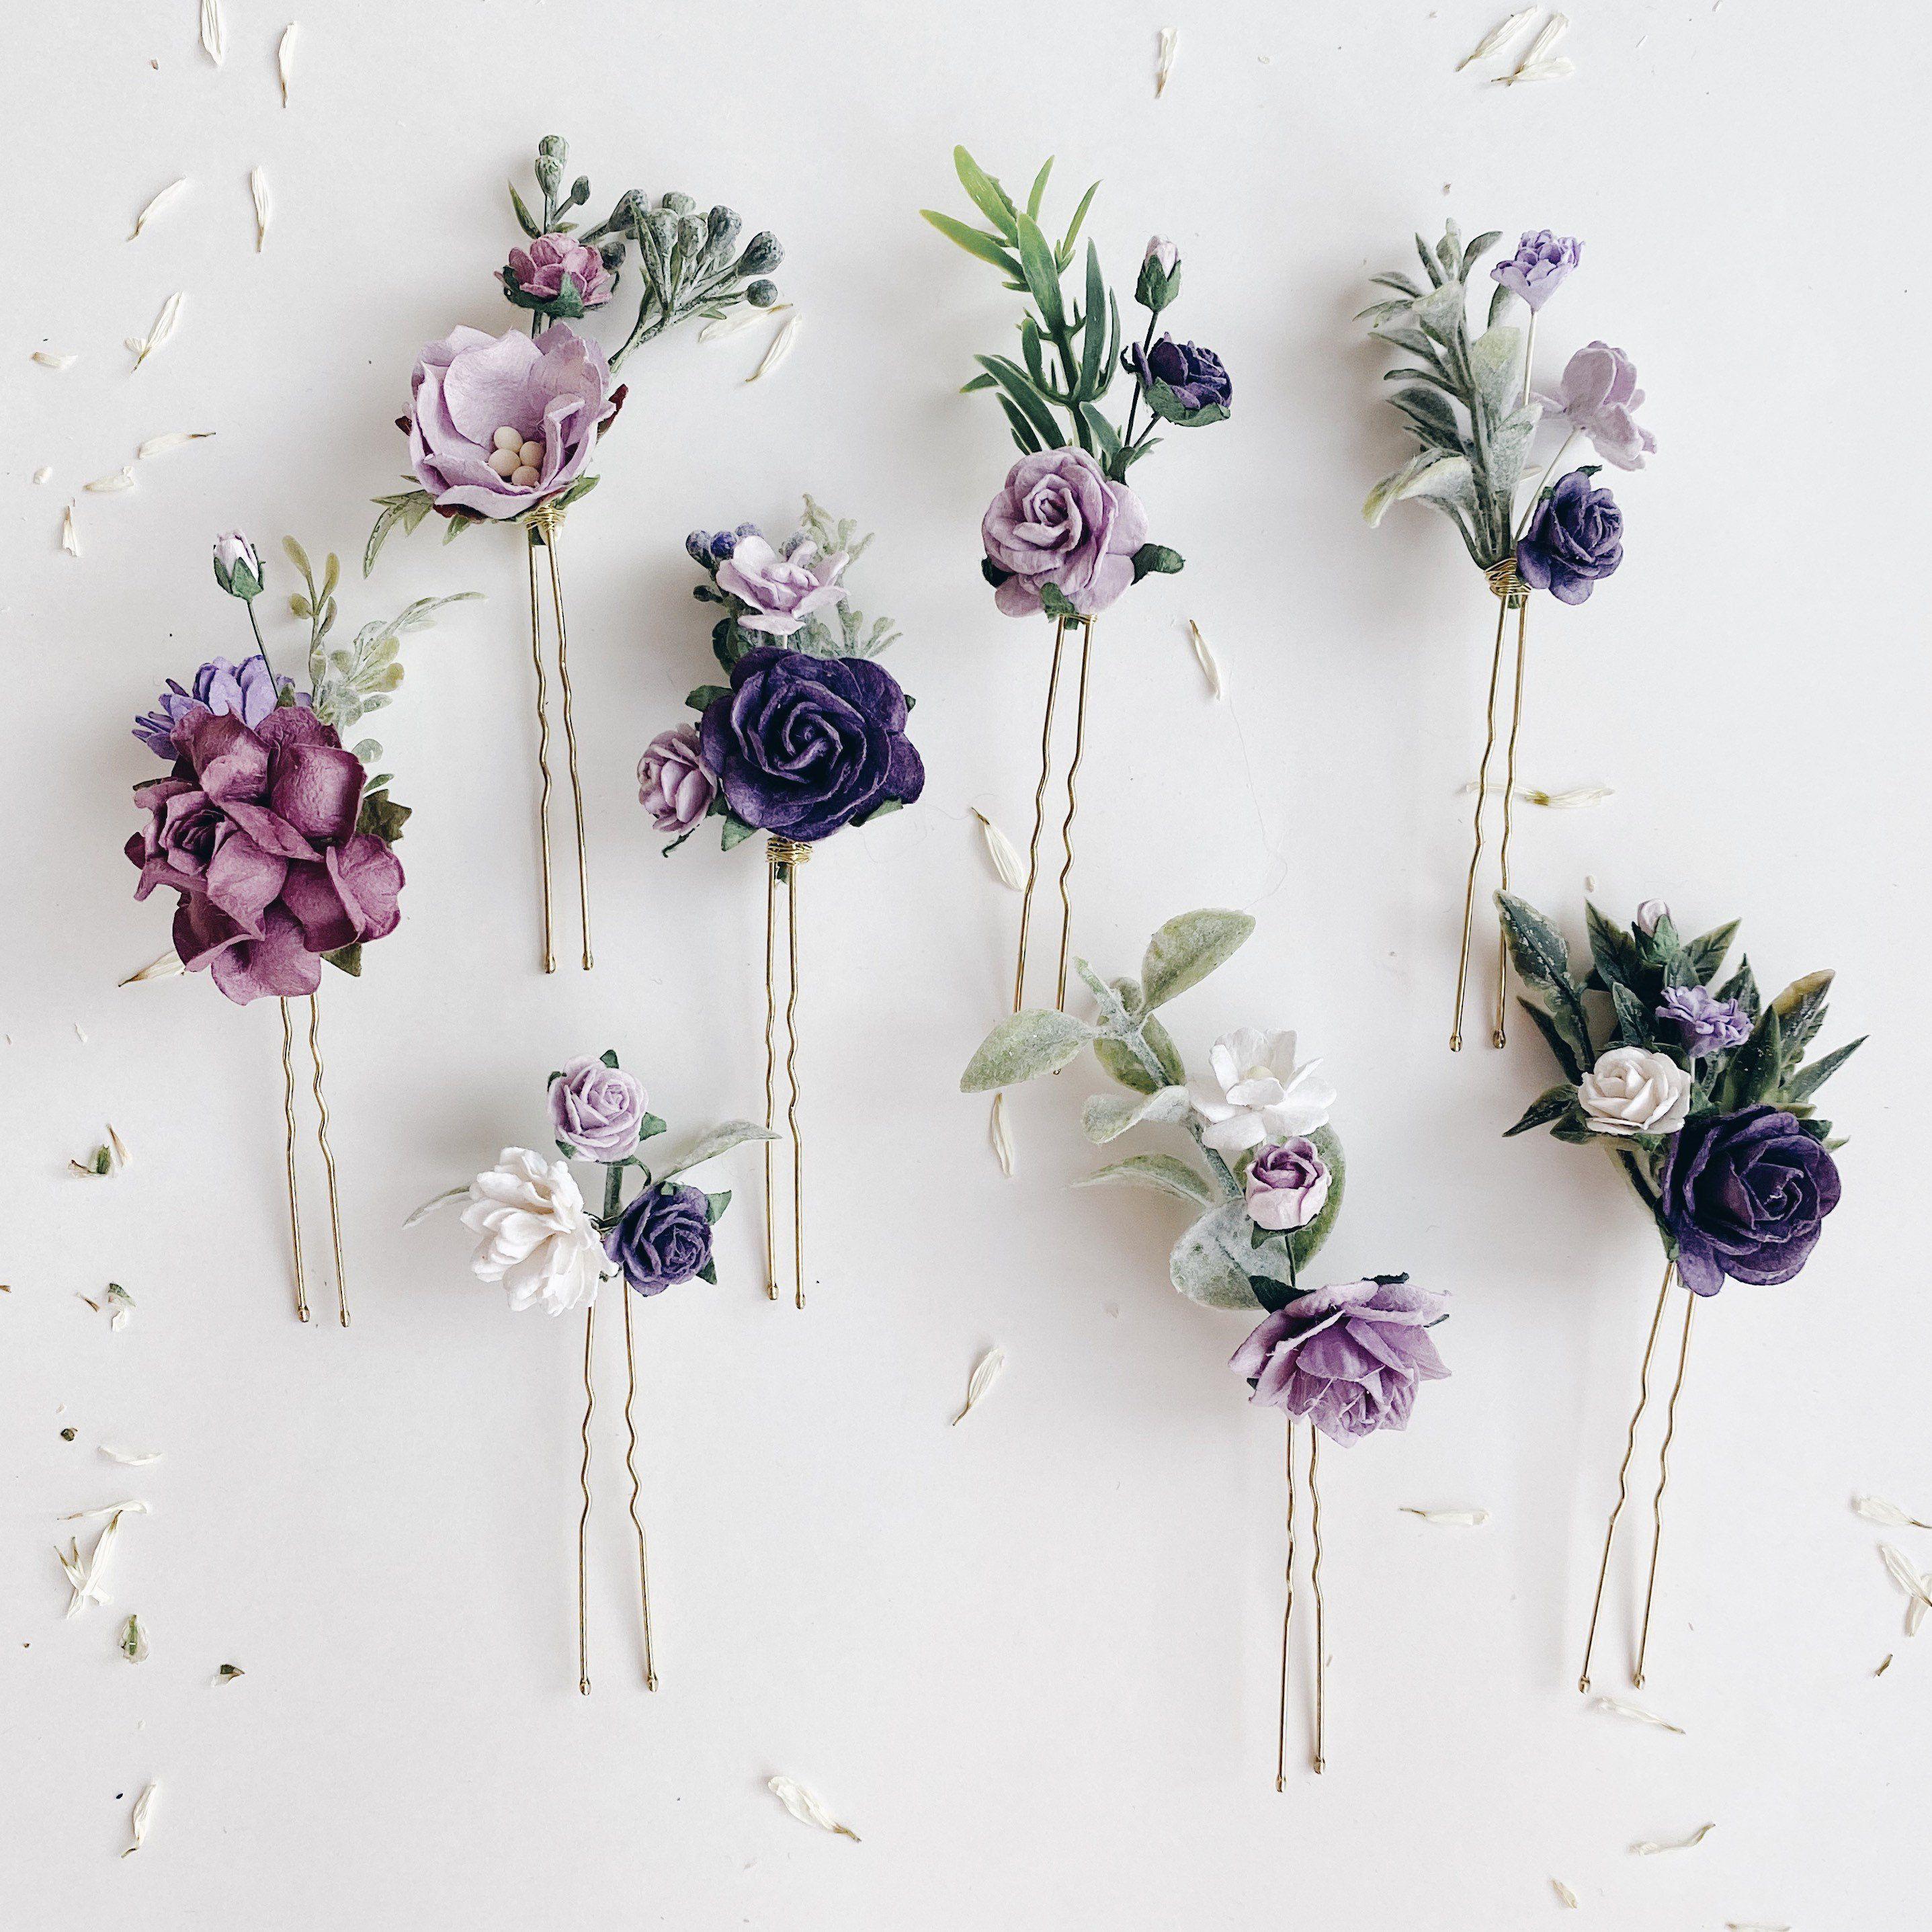 Flower Hair Pins Lilac Hair Flowers Set Of Hair Pins Bridal Hair Piece Purple Purple Hair Pins Hair Comb Wedding Lavender Hair Piece In 2020 Flower Hair Pin Flowers In Hair